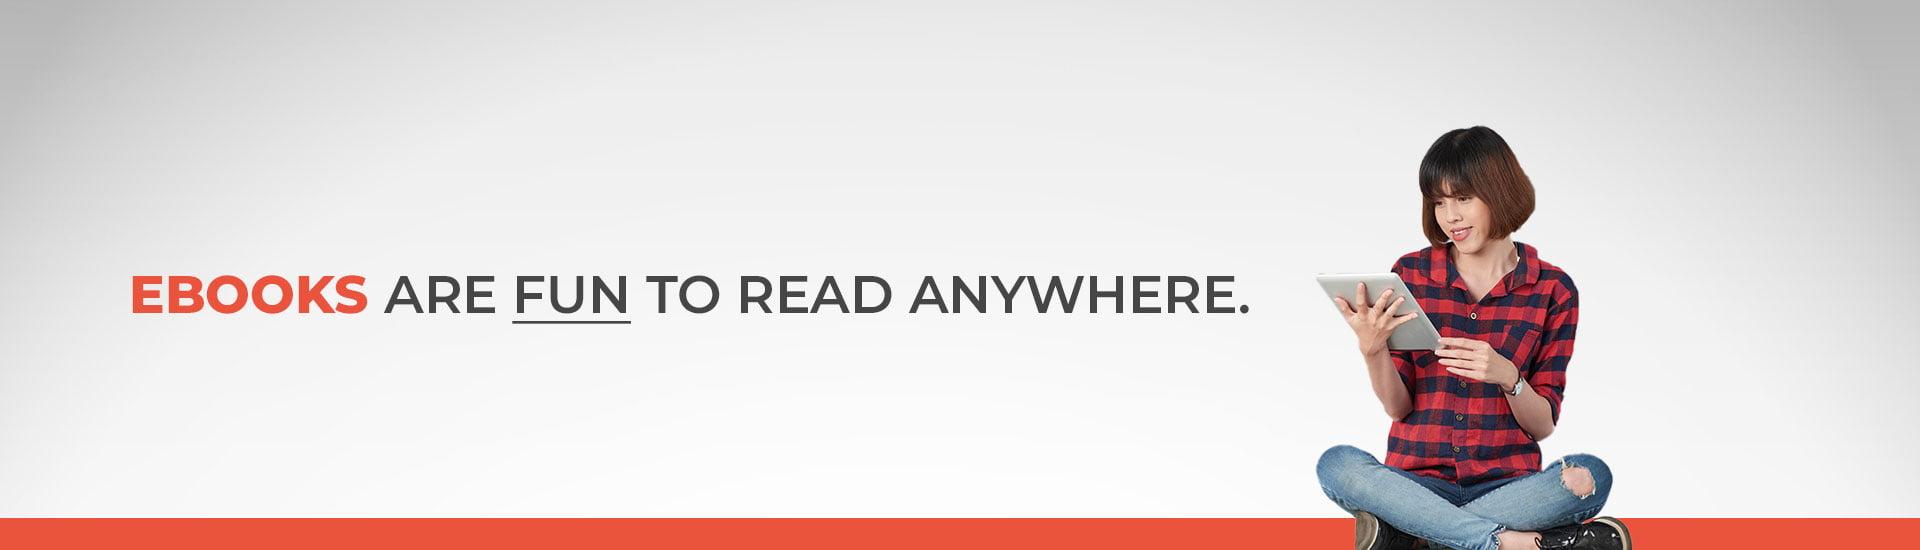 ebooks-marketing